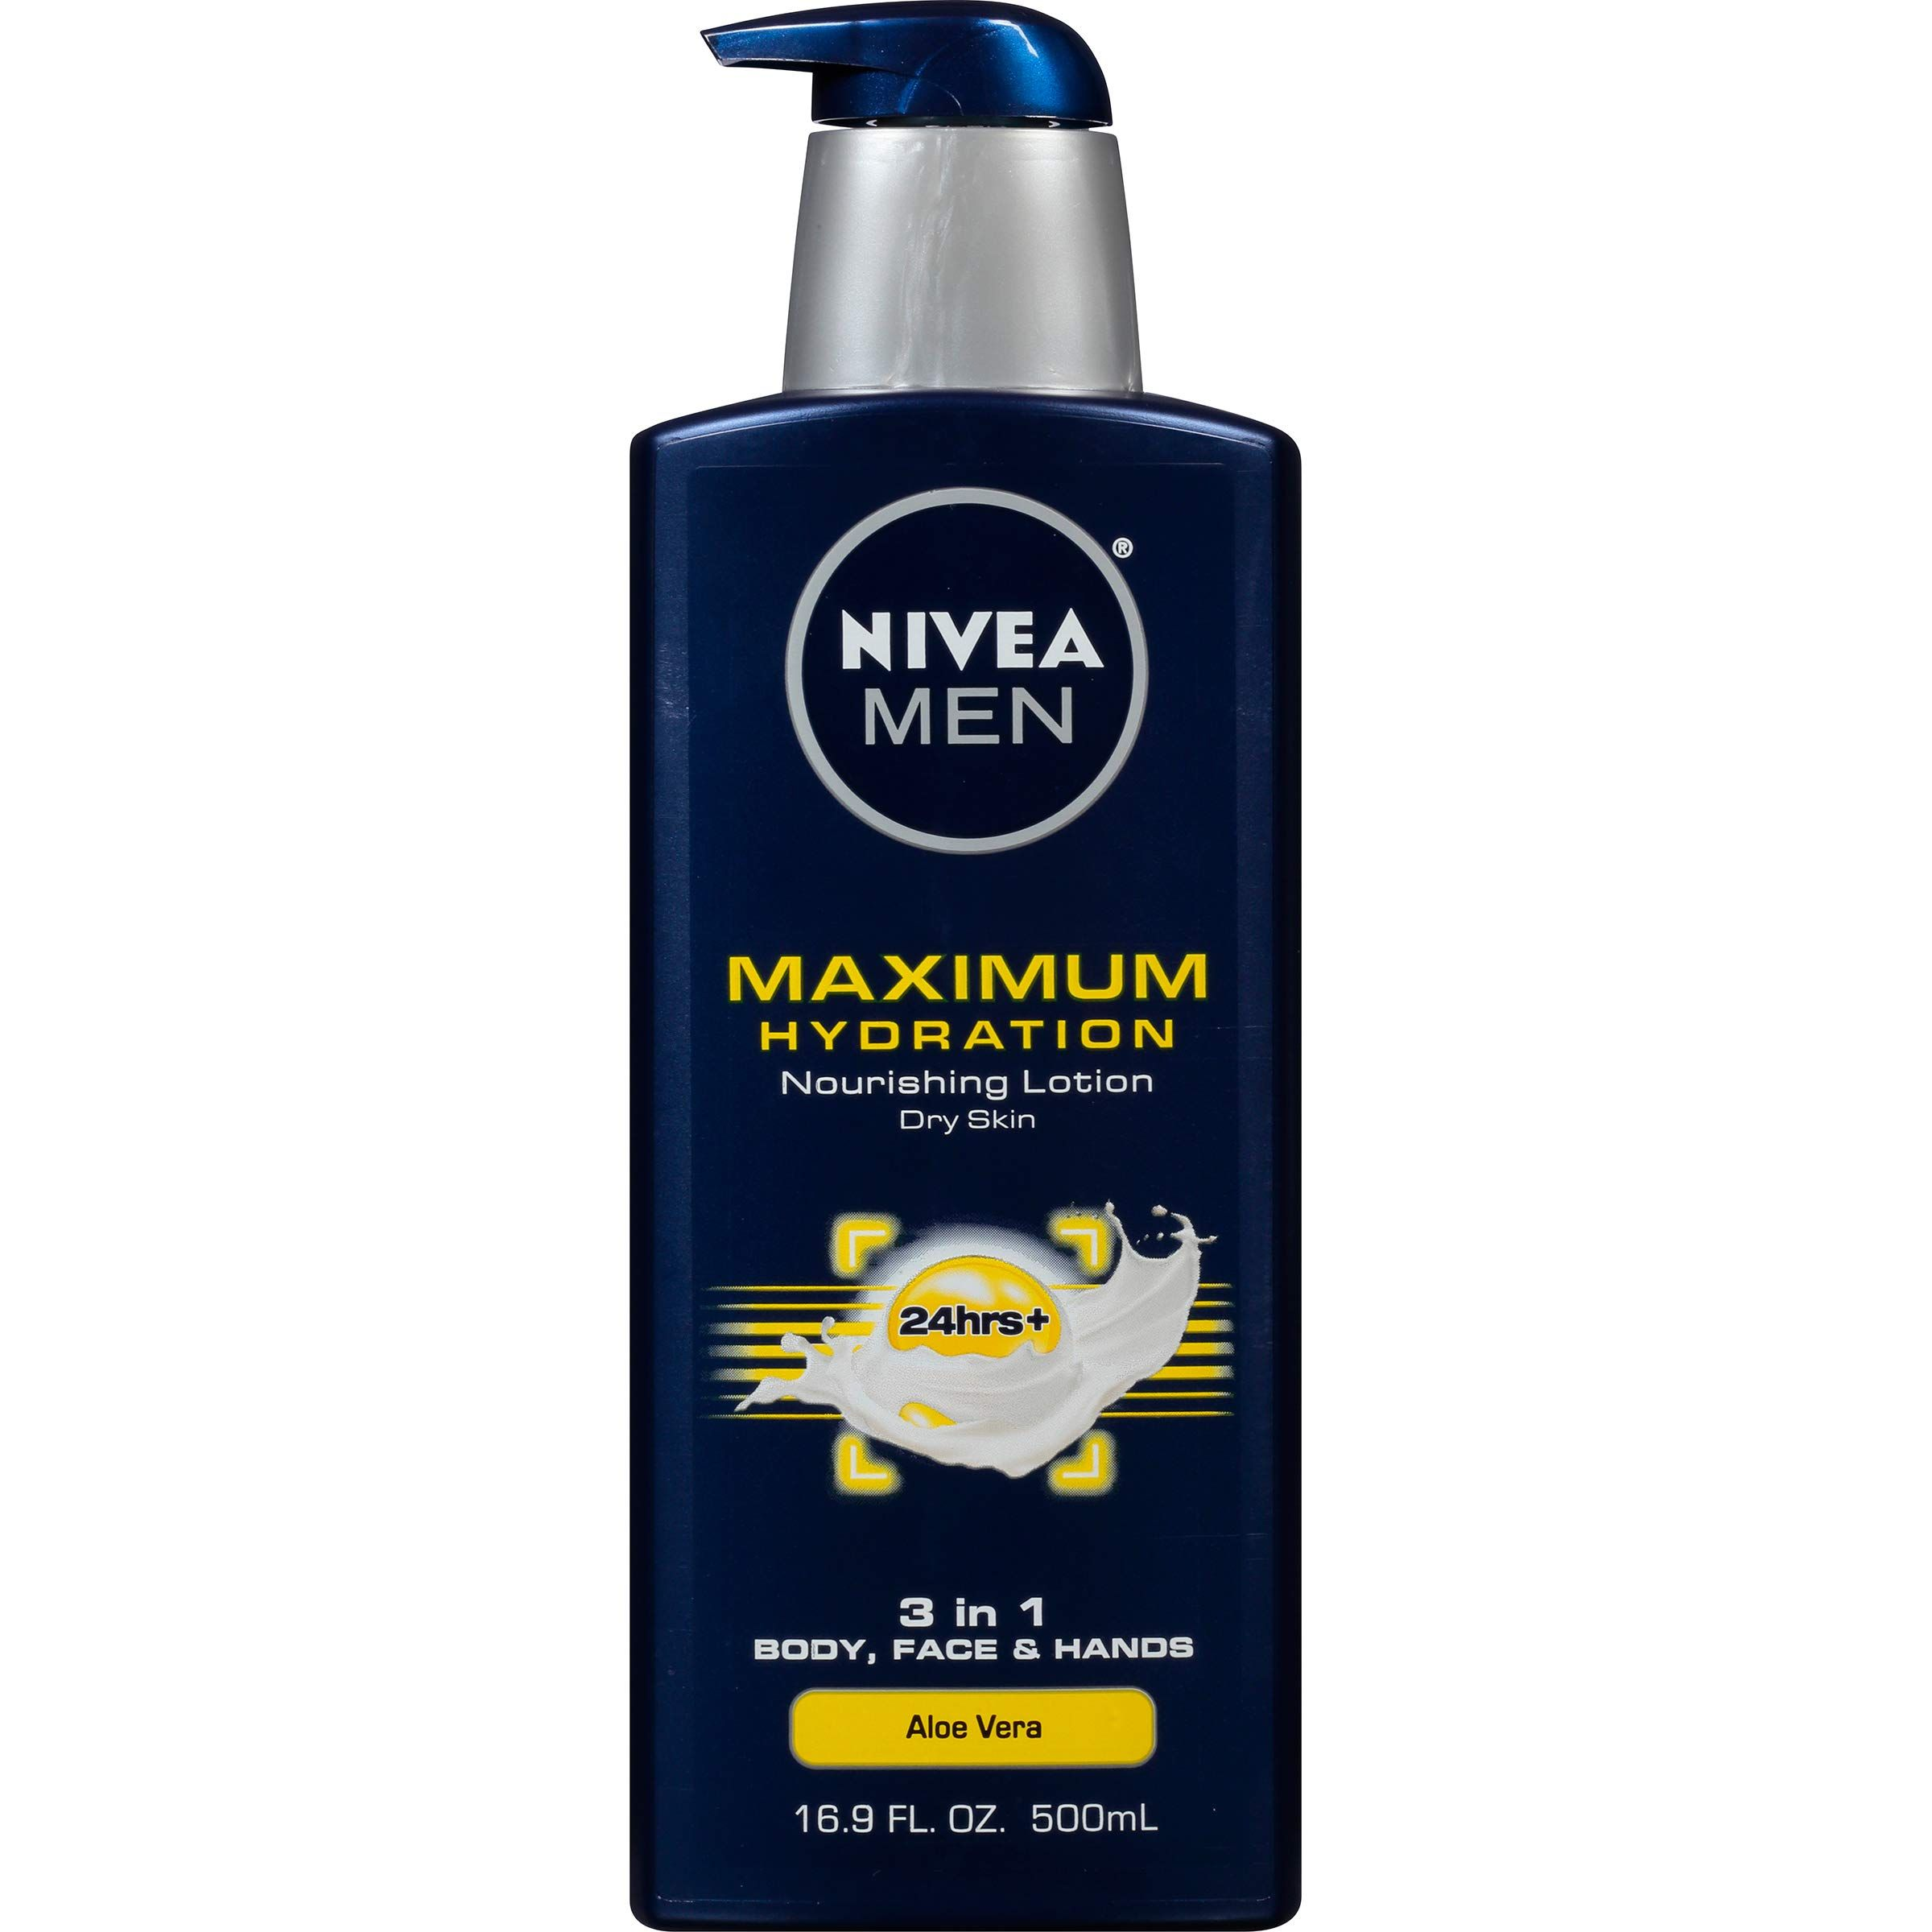 Nivea Men Maximum Hydration 3 In 1 Nourishing Lotion Body Face Hands 16 9 Oz Pump Bottle In 2020 Lotion For Dry Skin Best Body Moisturizer Best Lotion